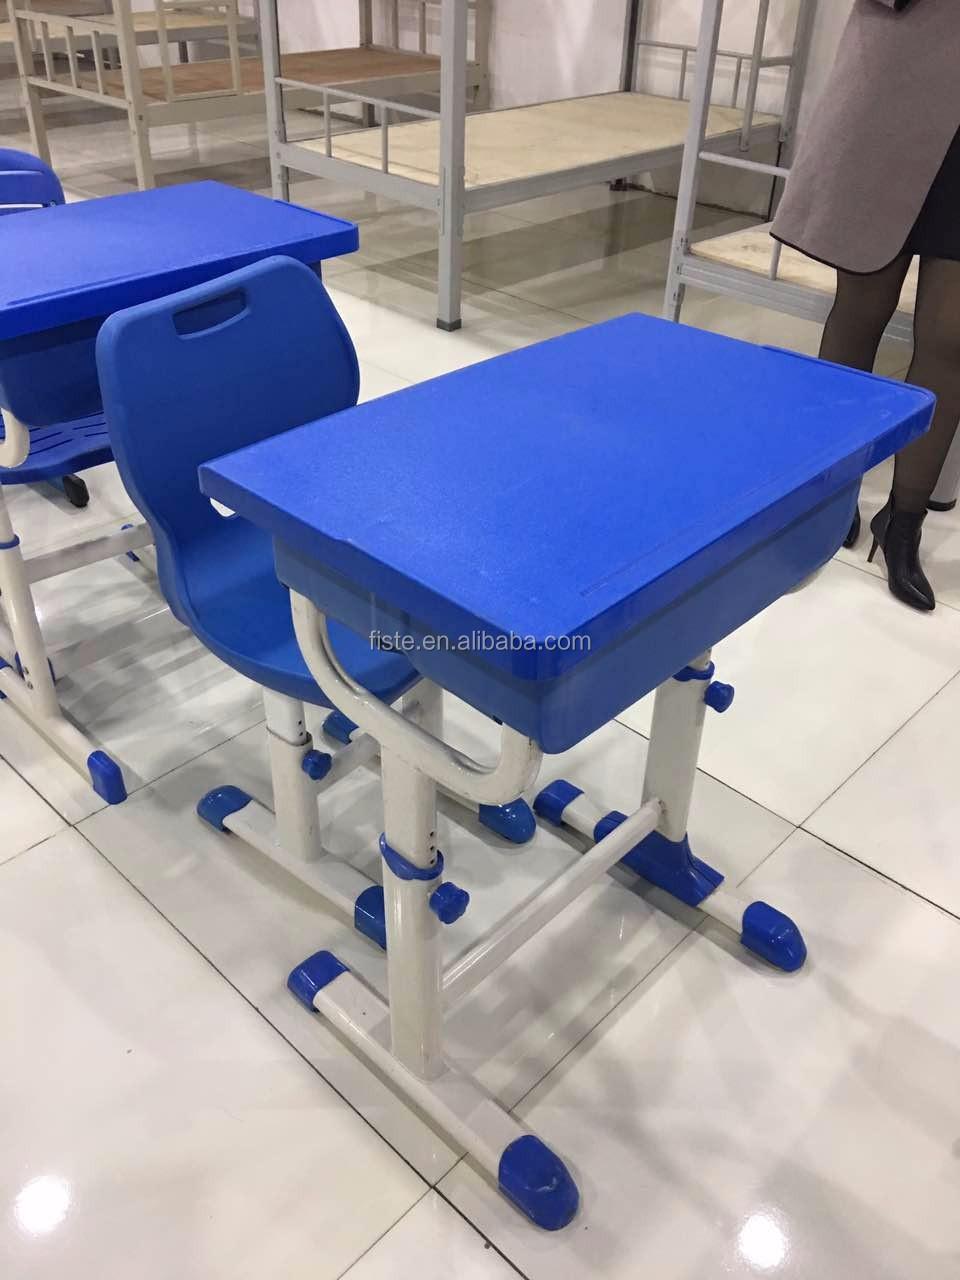 Fixed Single School Desk And Chair School Furniture Plastic Table And Chair Buy Plastic School